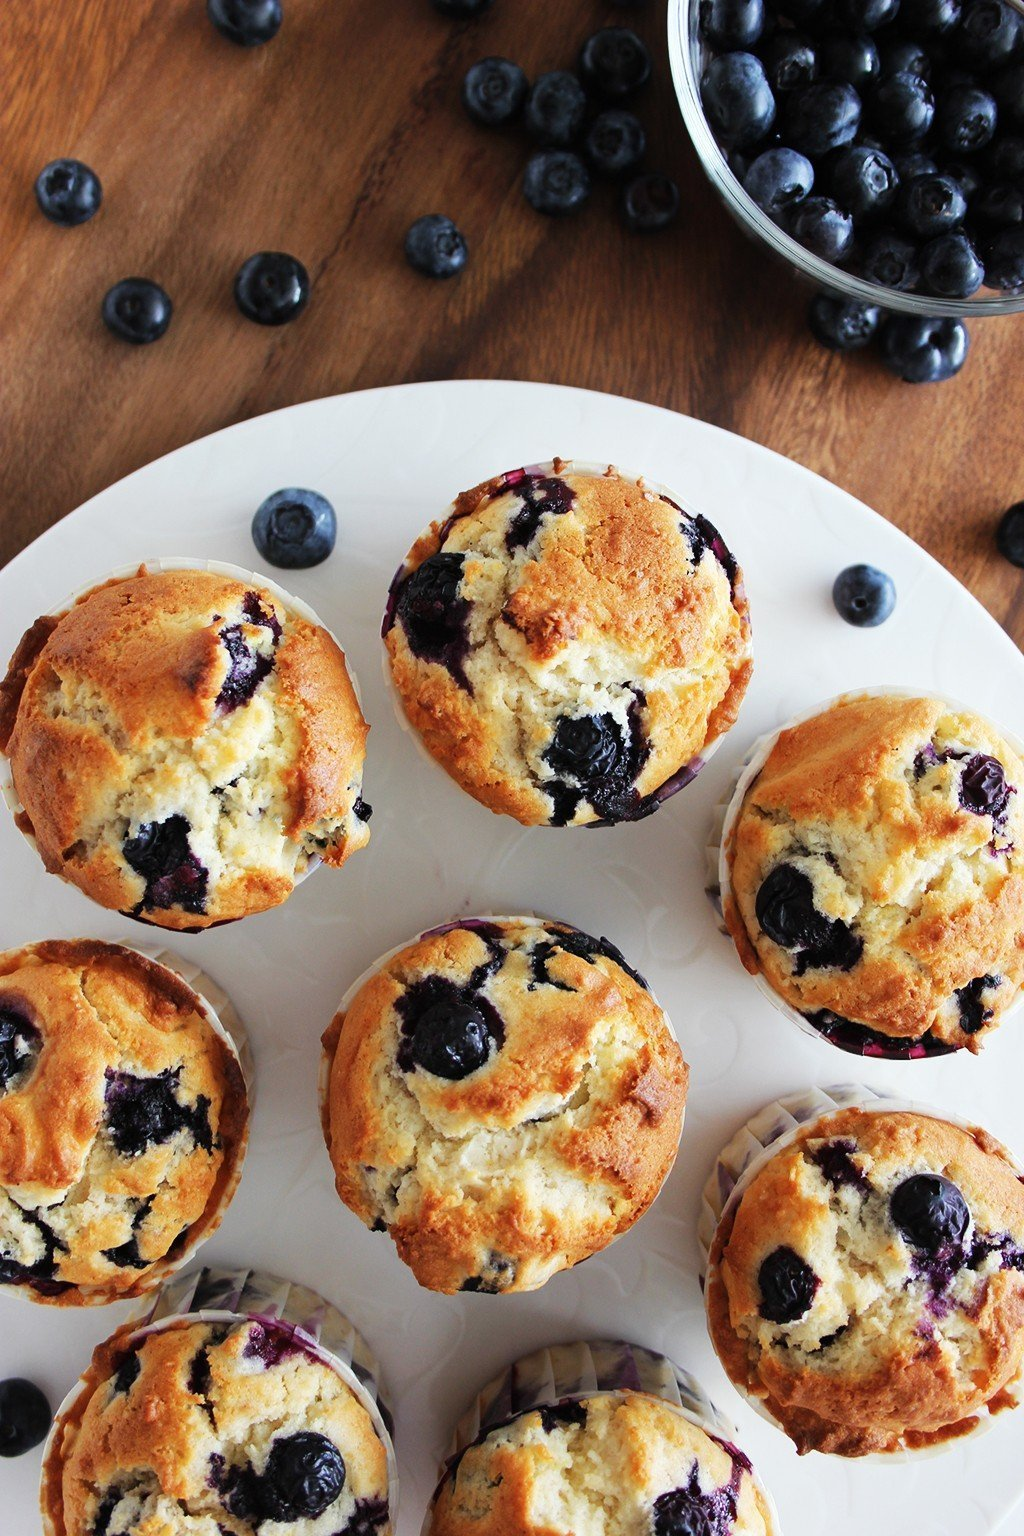 Best homemade blueberry muffins